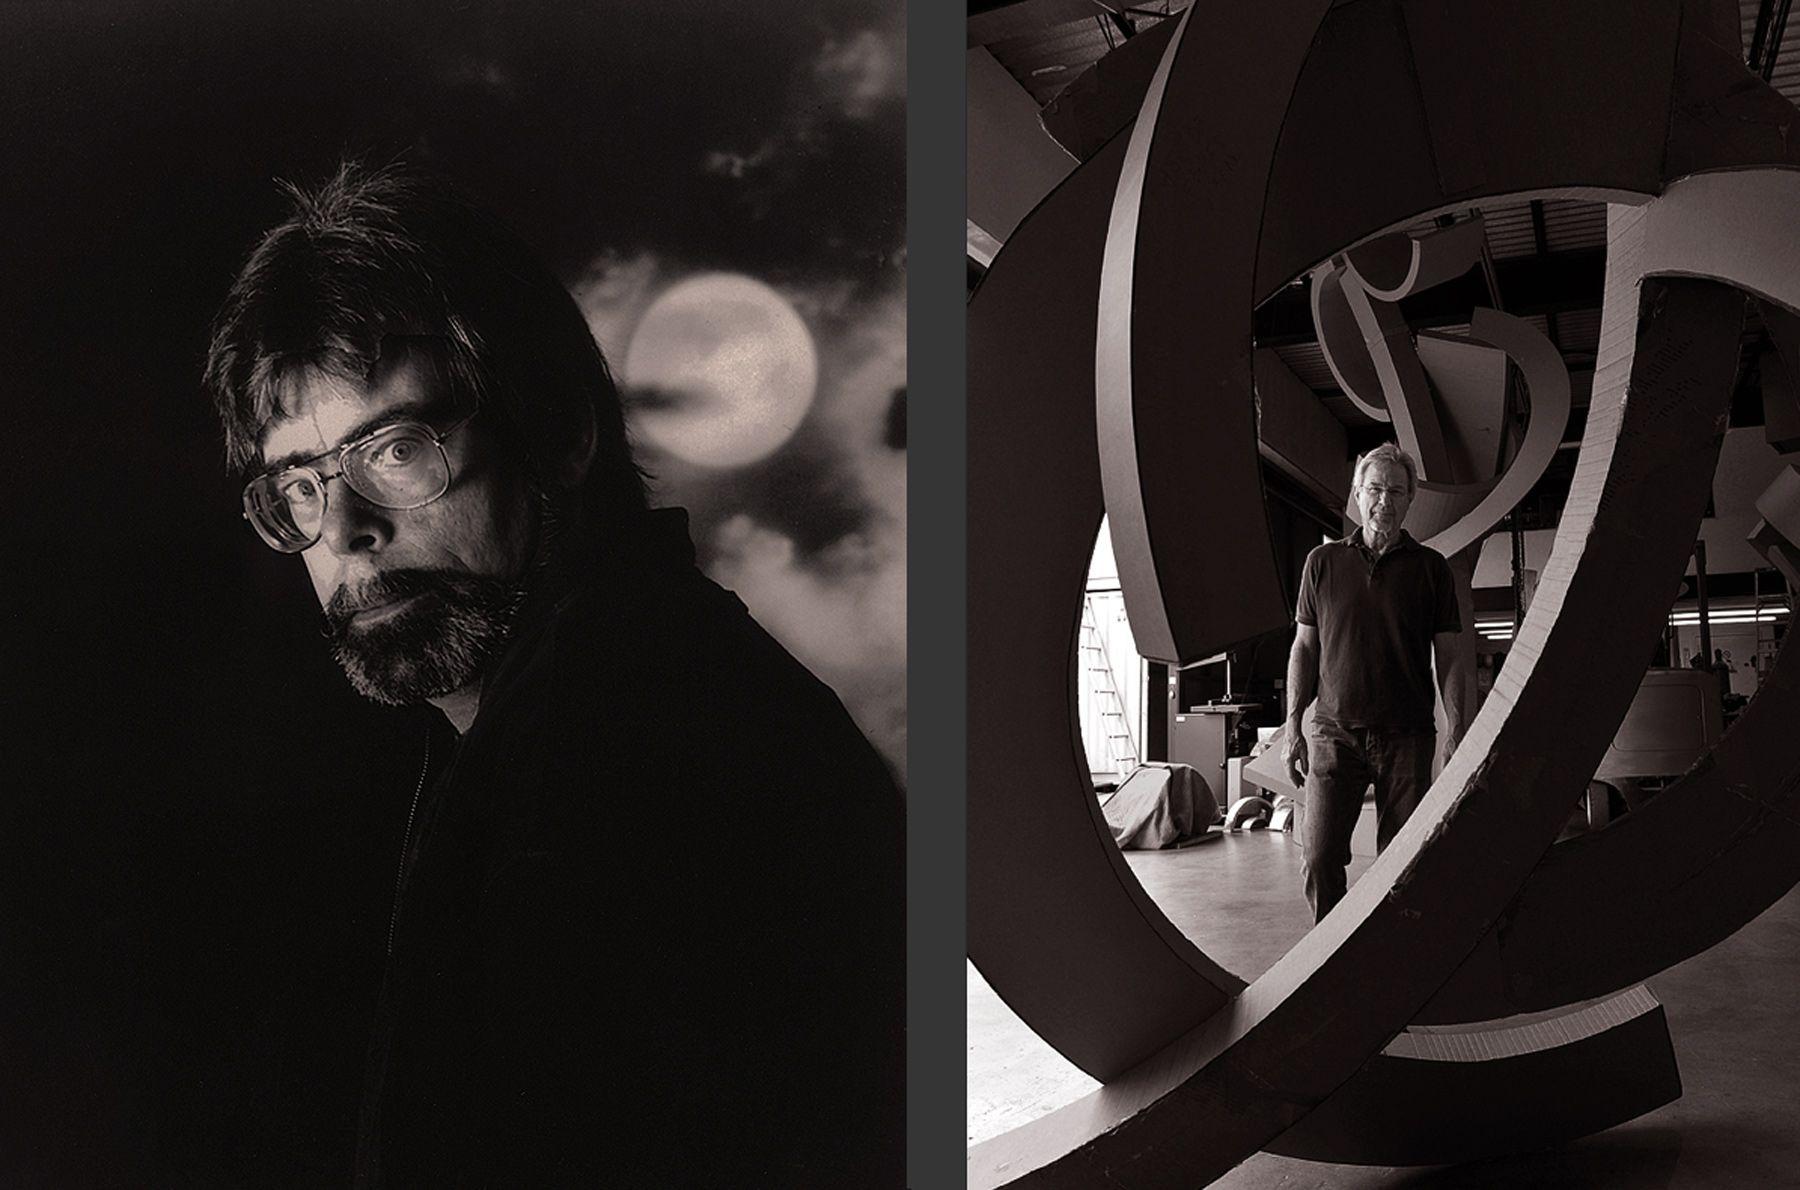 Stephen King & Guy Dill, sculptor